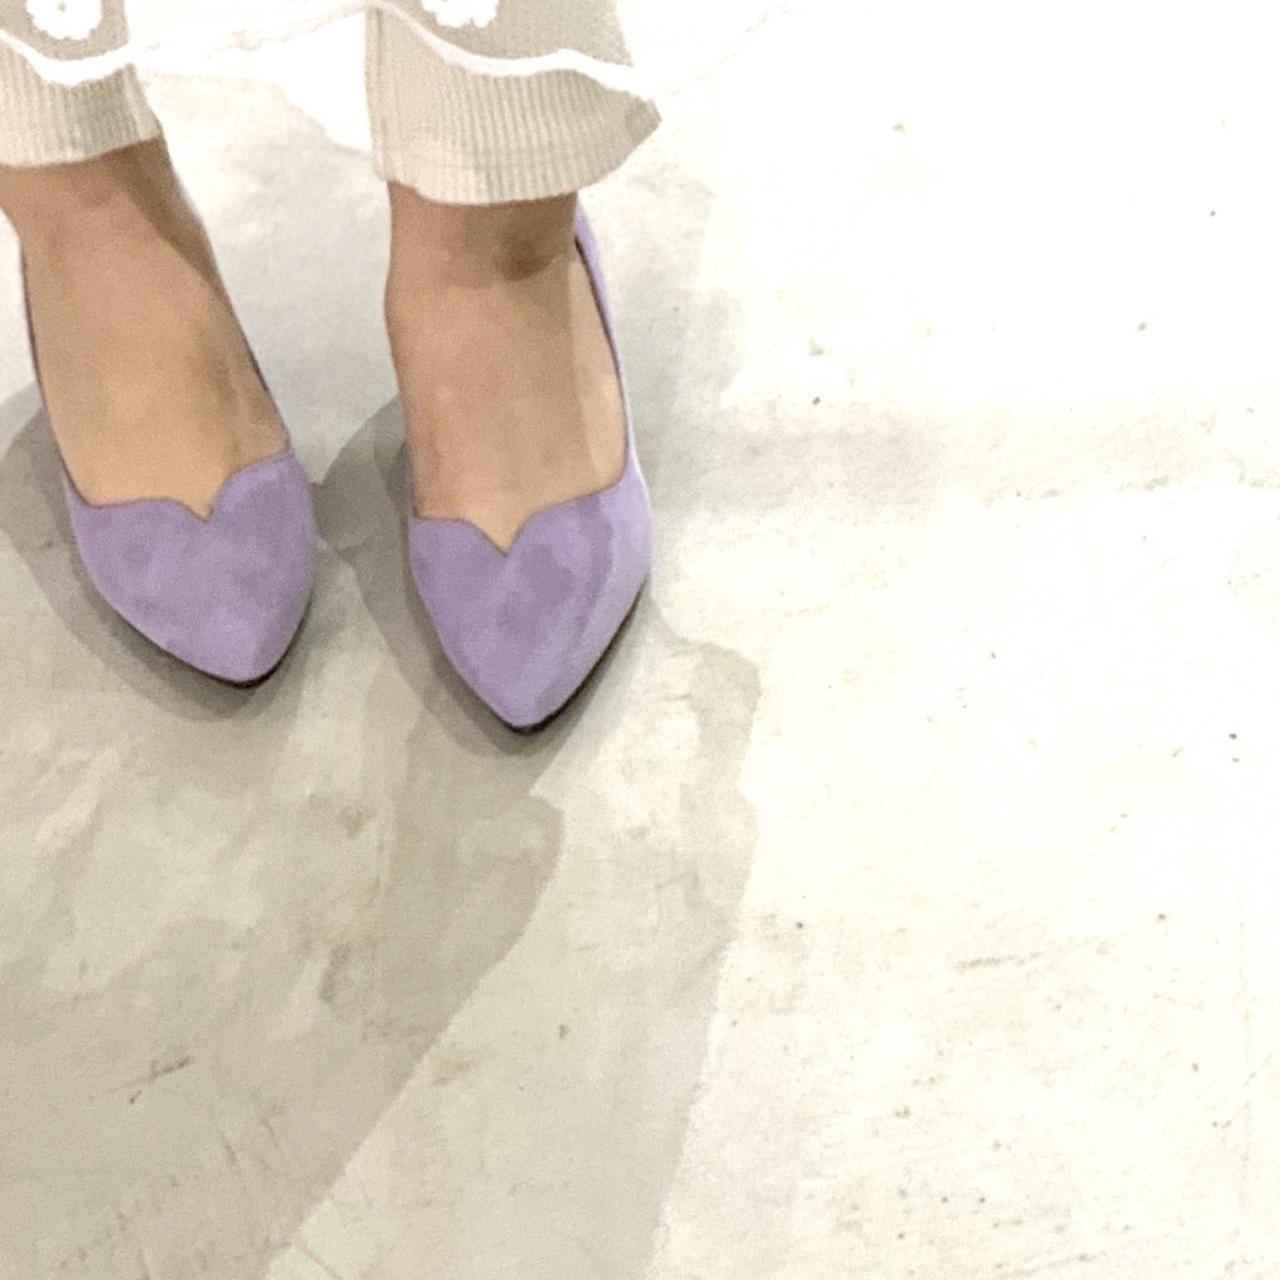 Mini Vcut heel Pumps|ミニVカットヒールパンプス|#pf8270 |【POMFLEUR】|madeinjapan|日本製